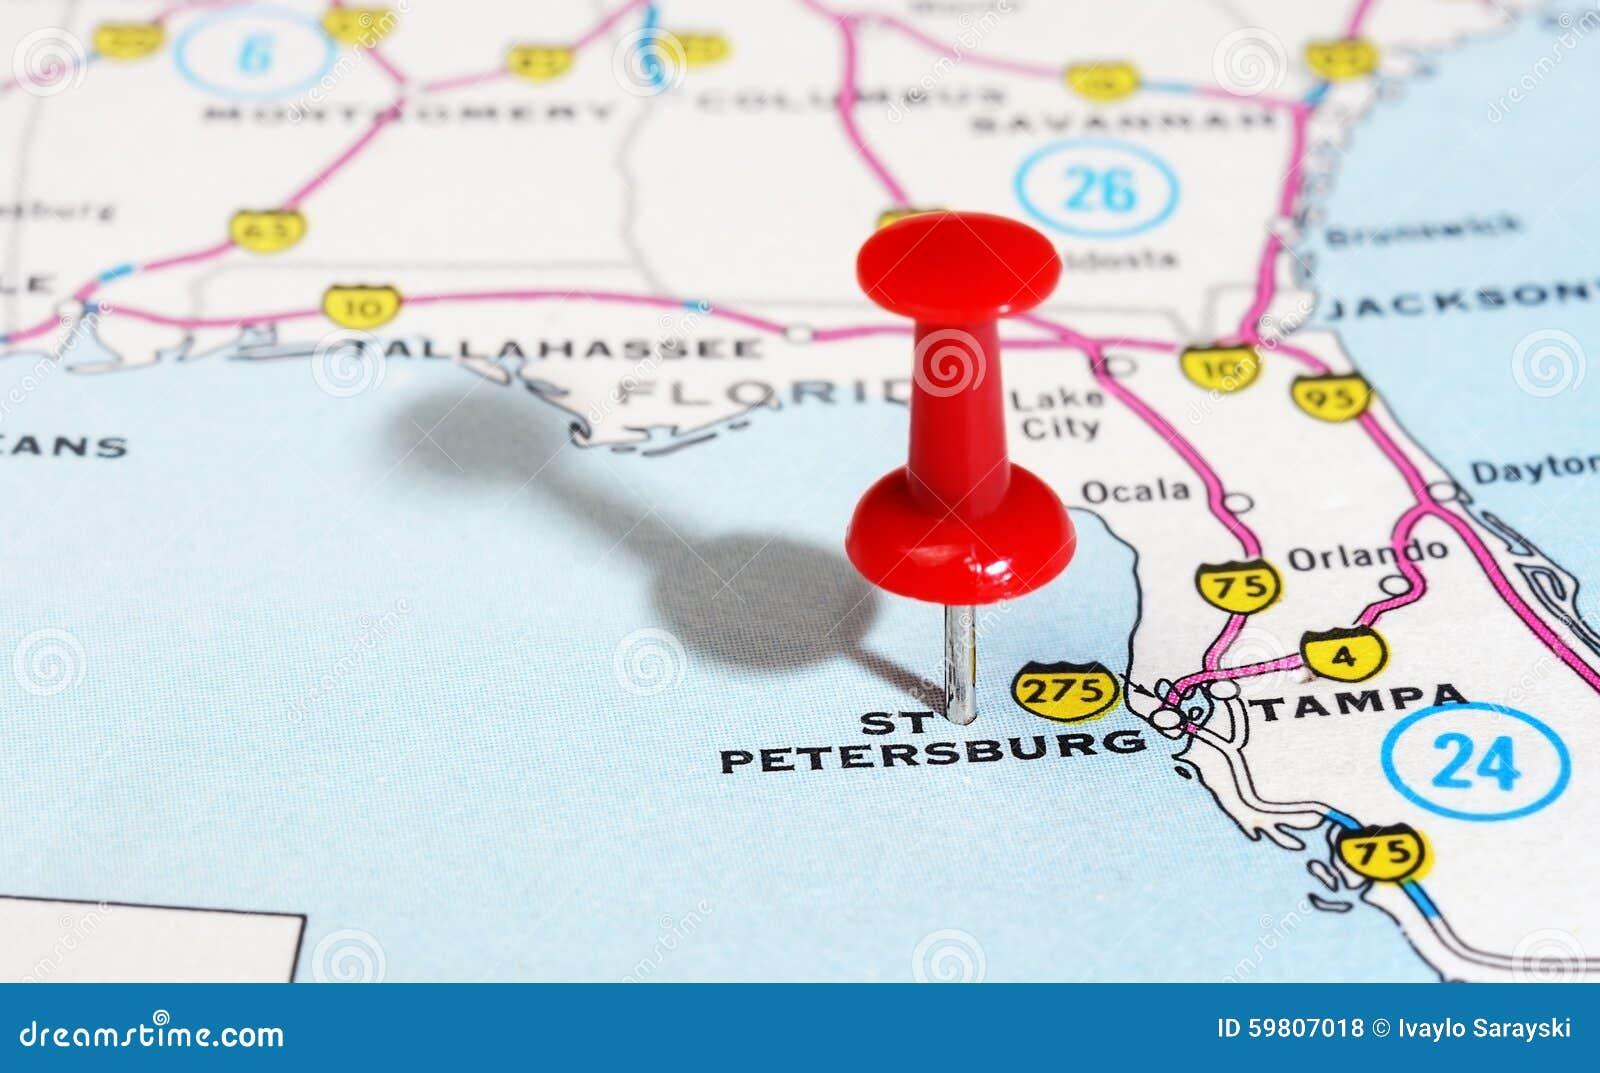 St  Petersburg USA Florida Map Stock Photo - Image of states